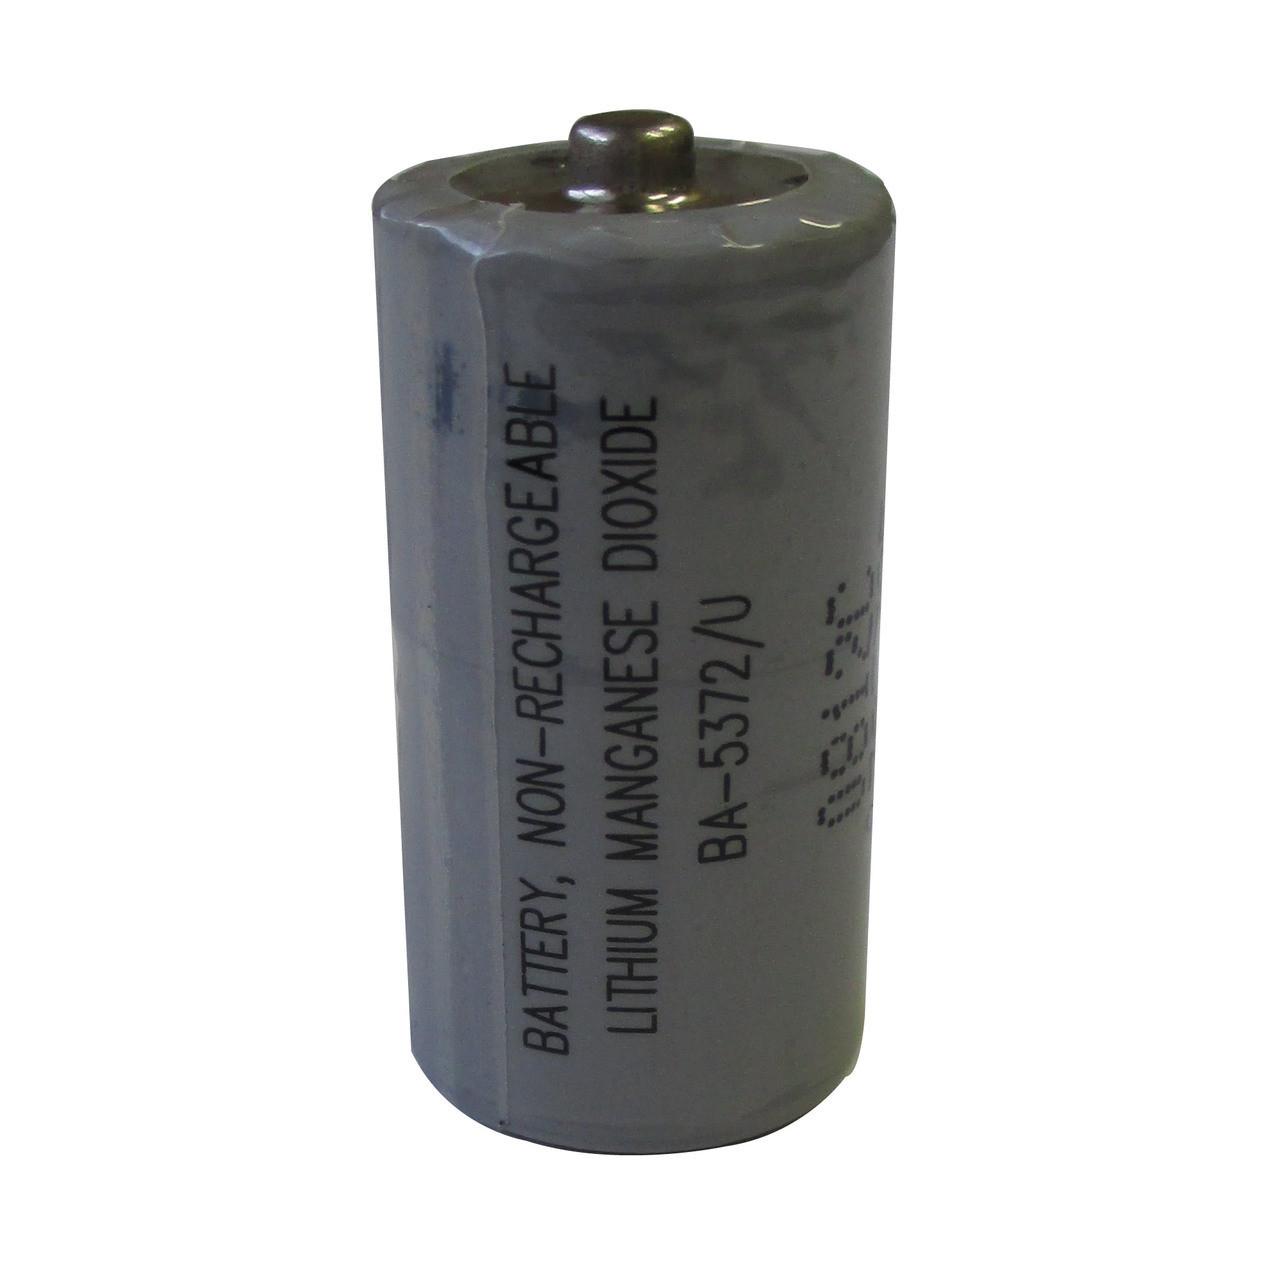 Saft BA-5372/U Battery